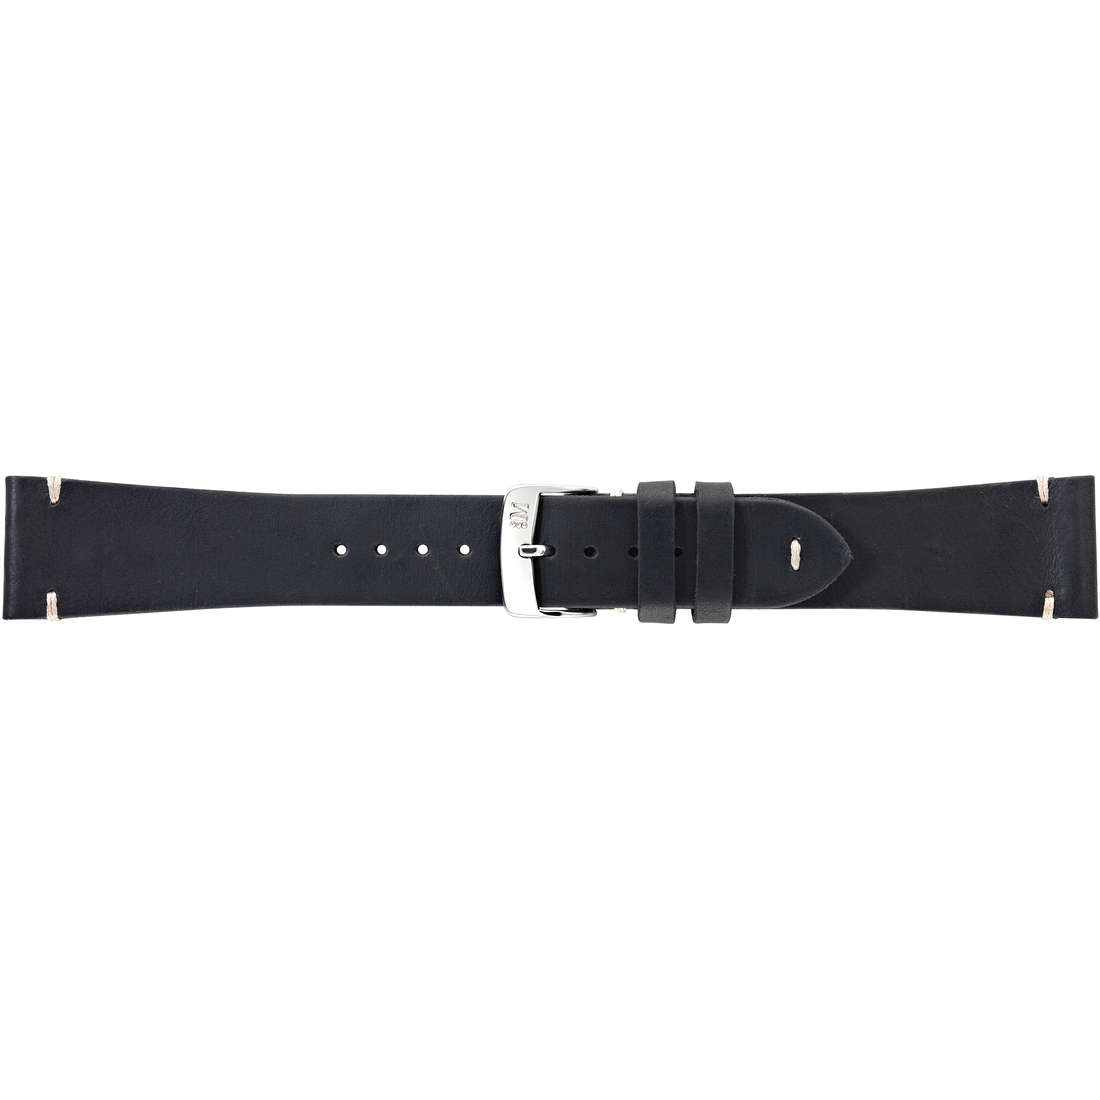 watch watch bands watch straps man Morellato Manufatti A01X4541A76019CR18